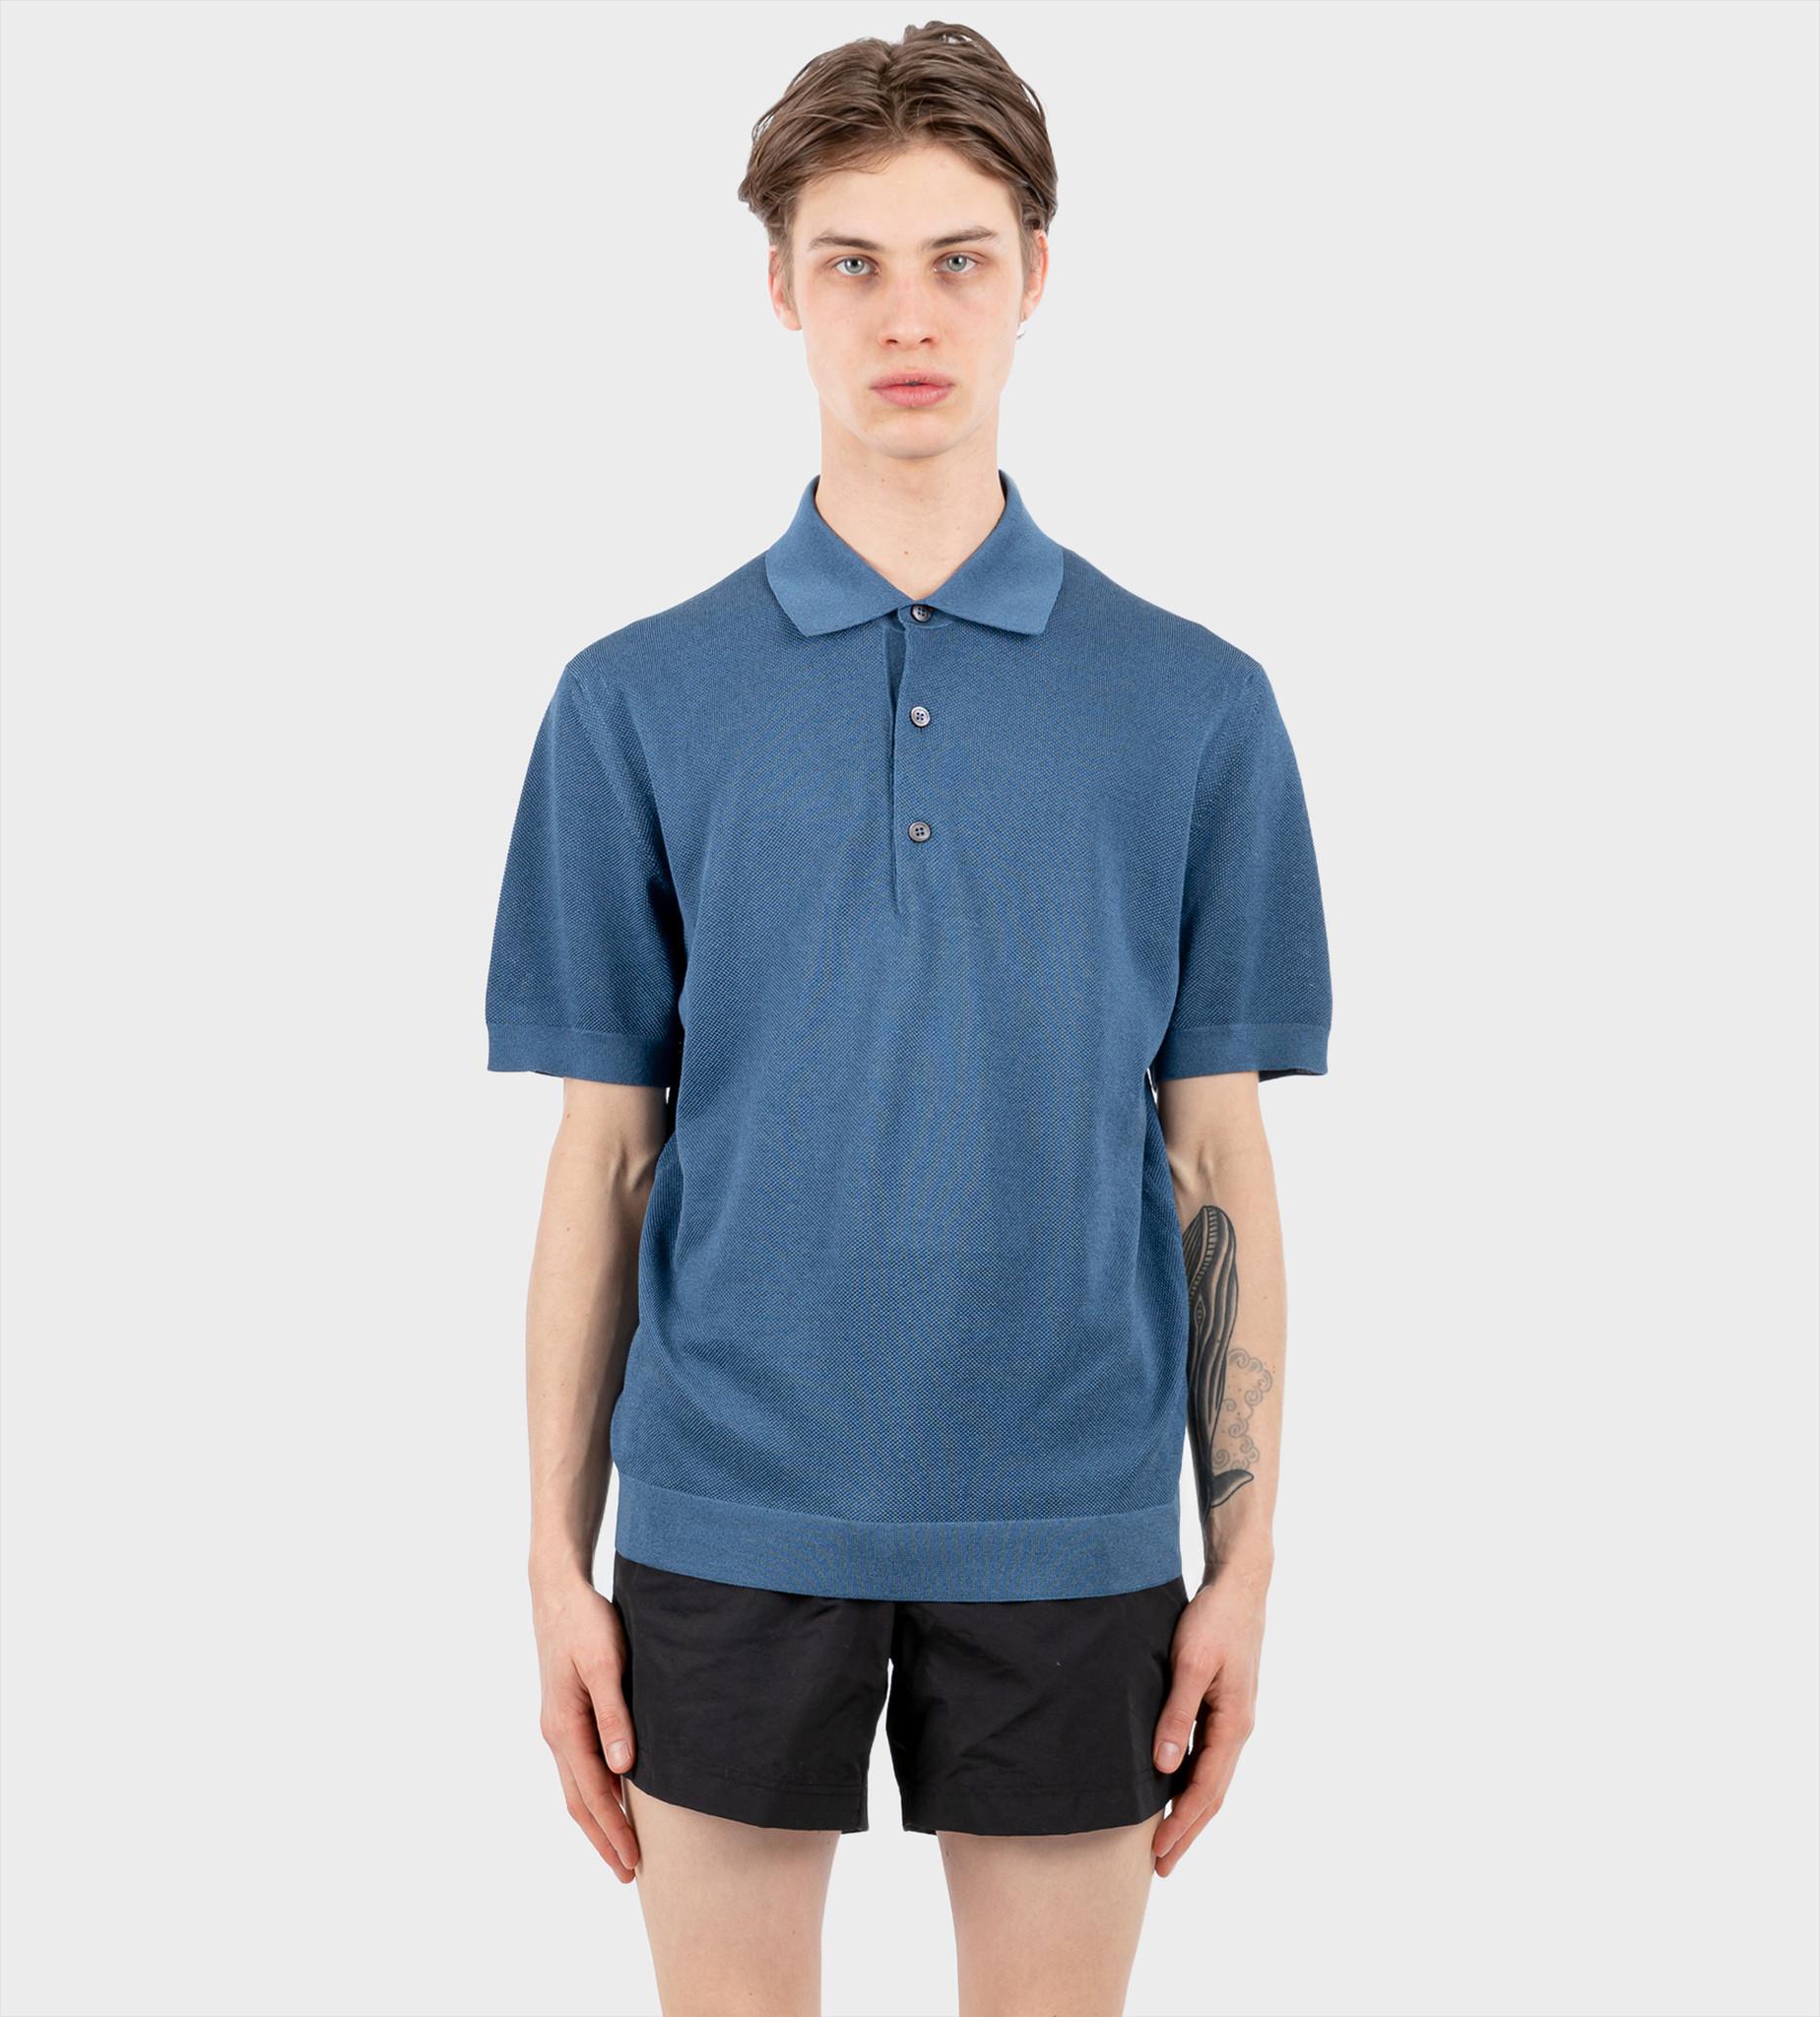 TOM FORD Bicolour Stitch Polo Blue